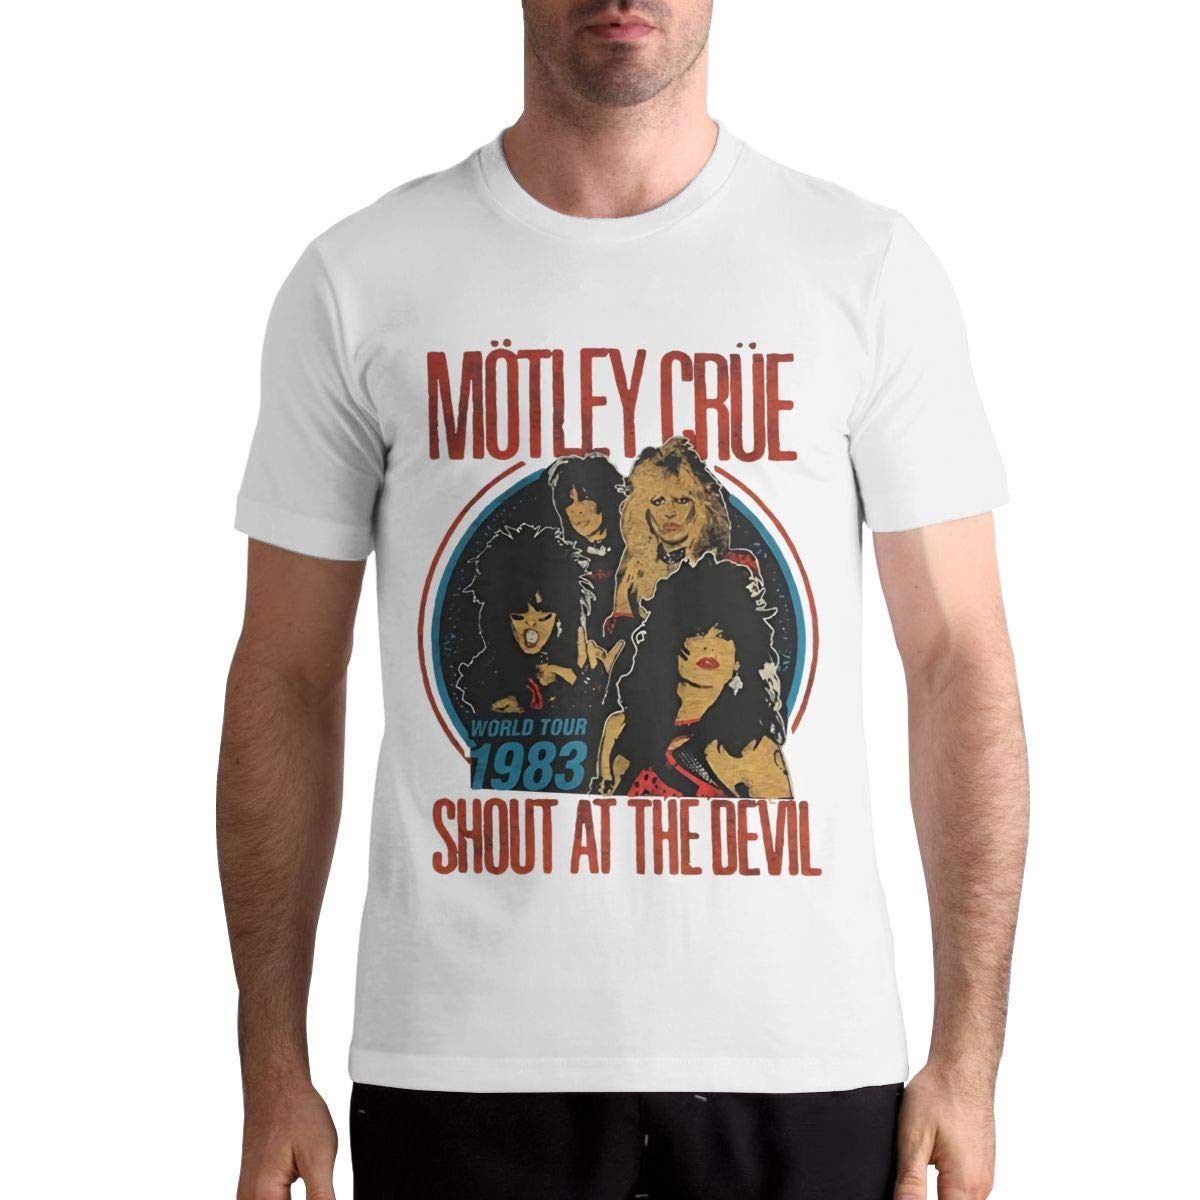 Motley Crue T Shirt Sports S Tops Short Sleeve Tee